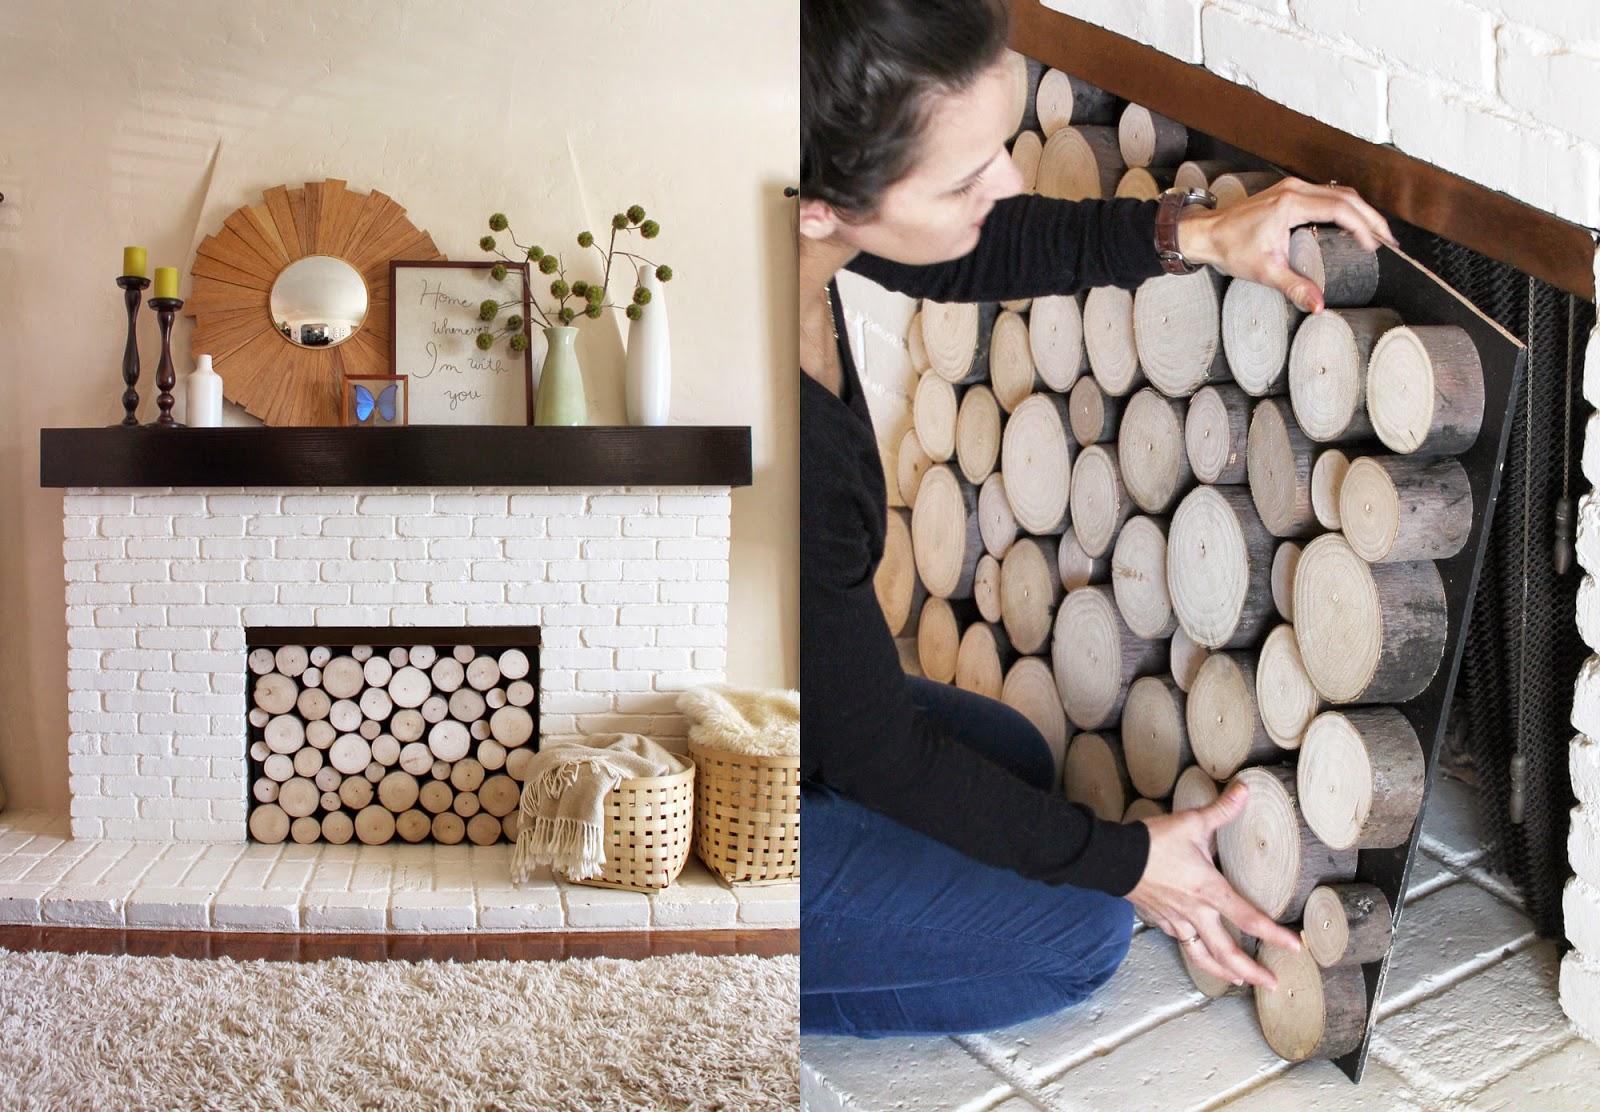 la fabrique d co chemin e condamn e la clef d 39 une d co r ussie. Black Bedroom Furniture Sets. Home Design Ideas